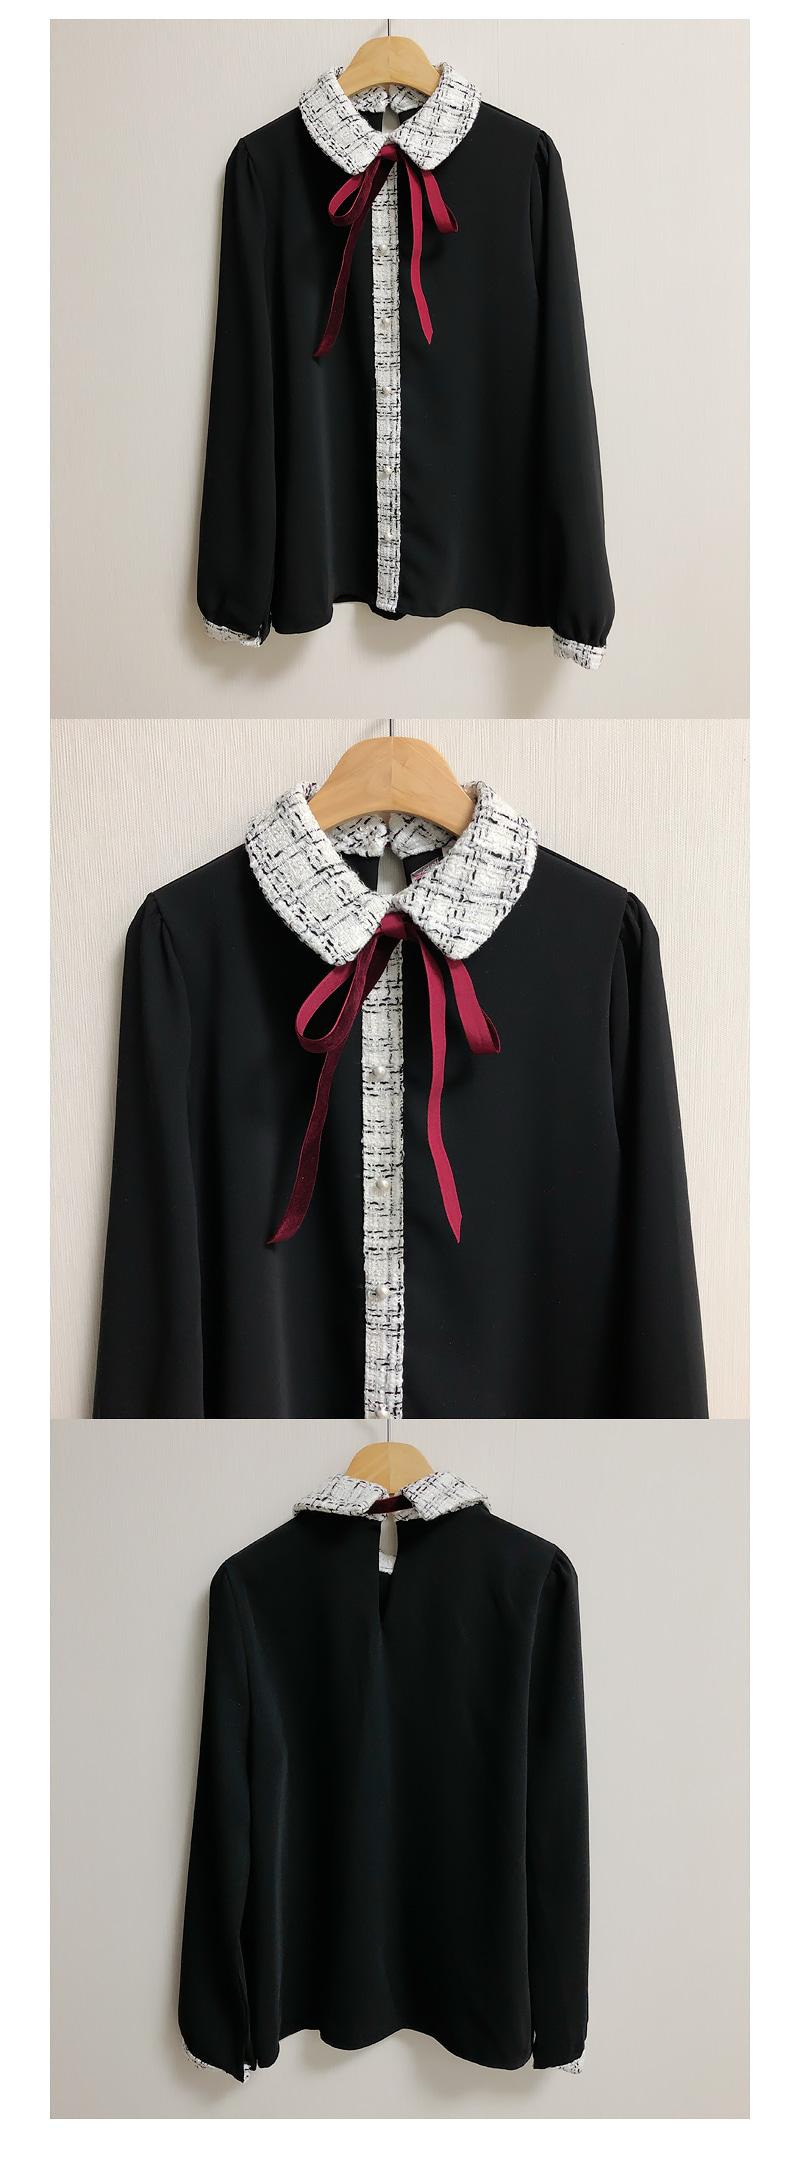 Allie Tweed Color Ribbon Blouse 2color